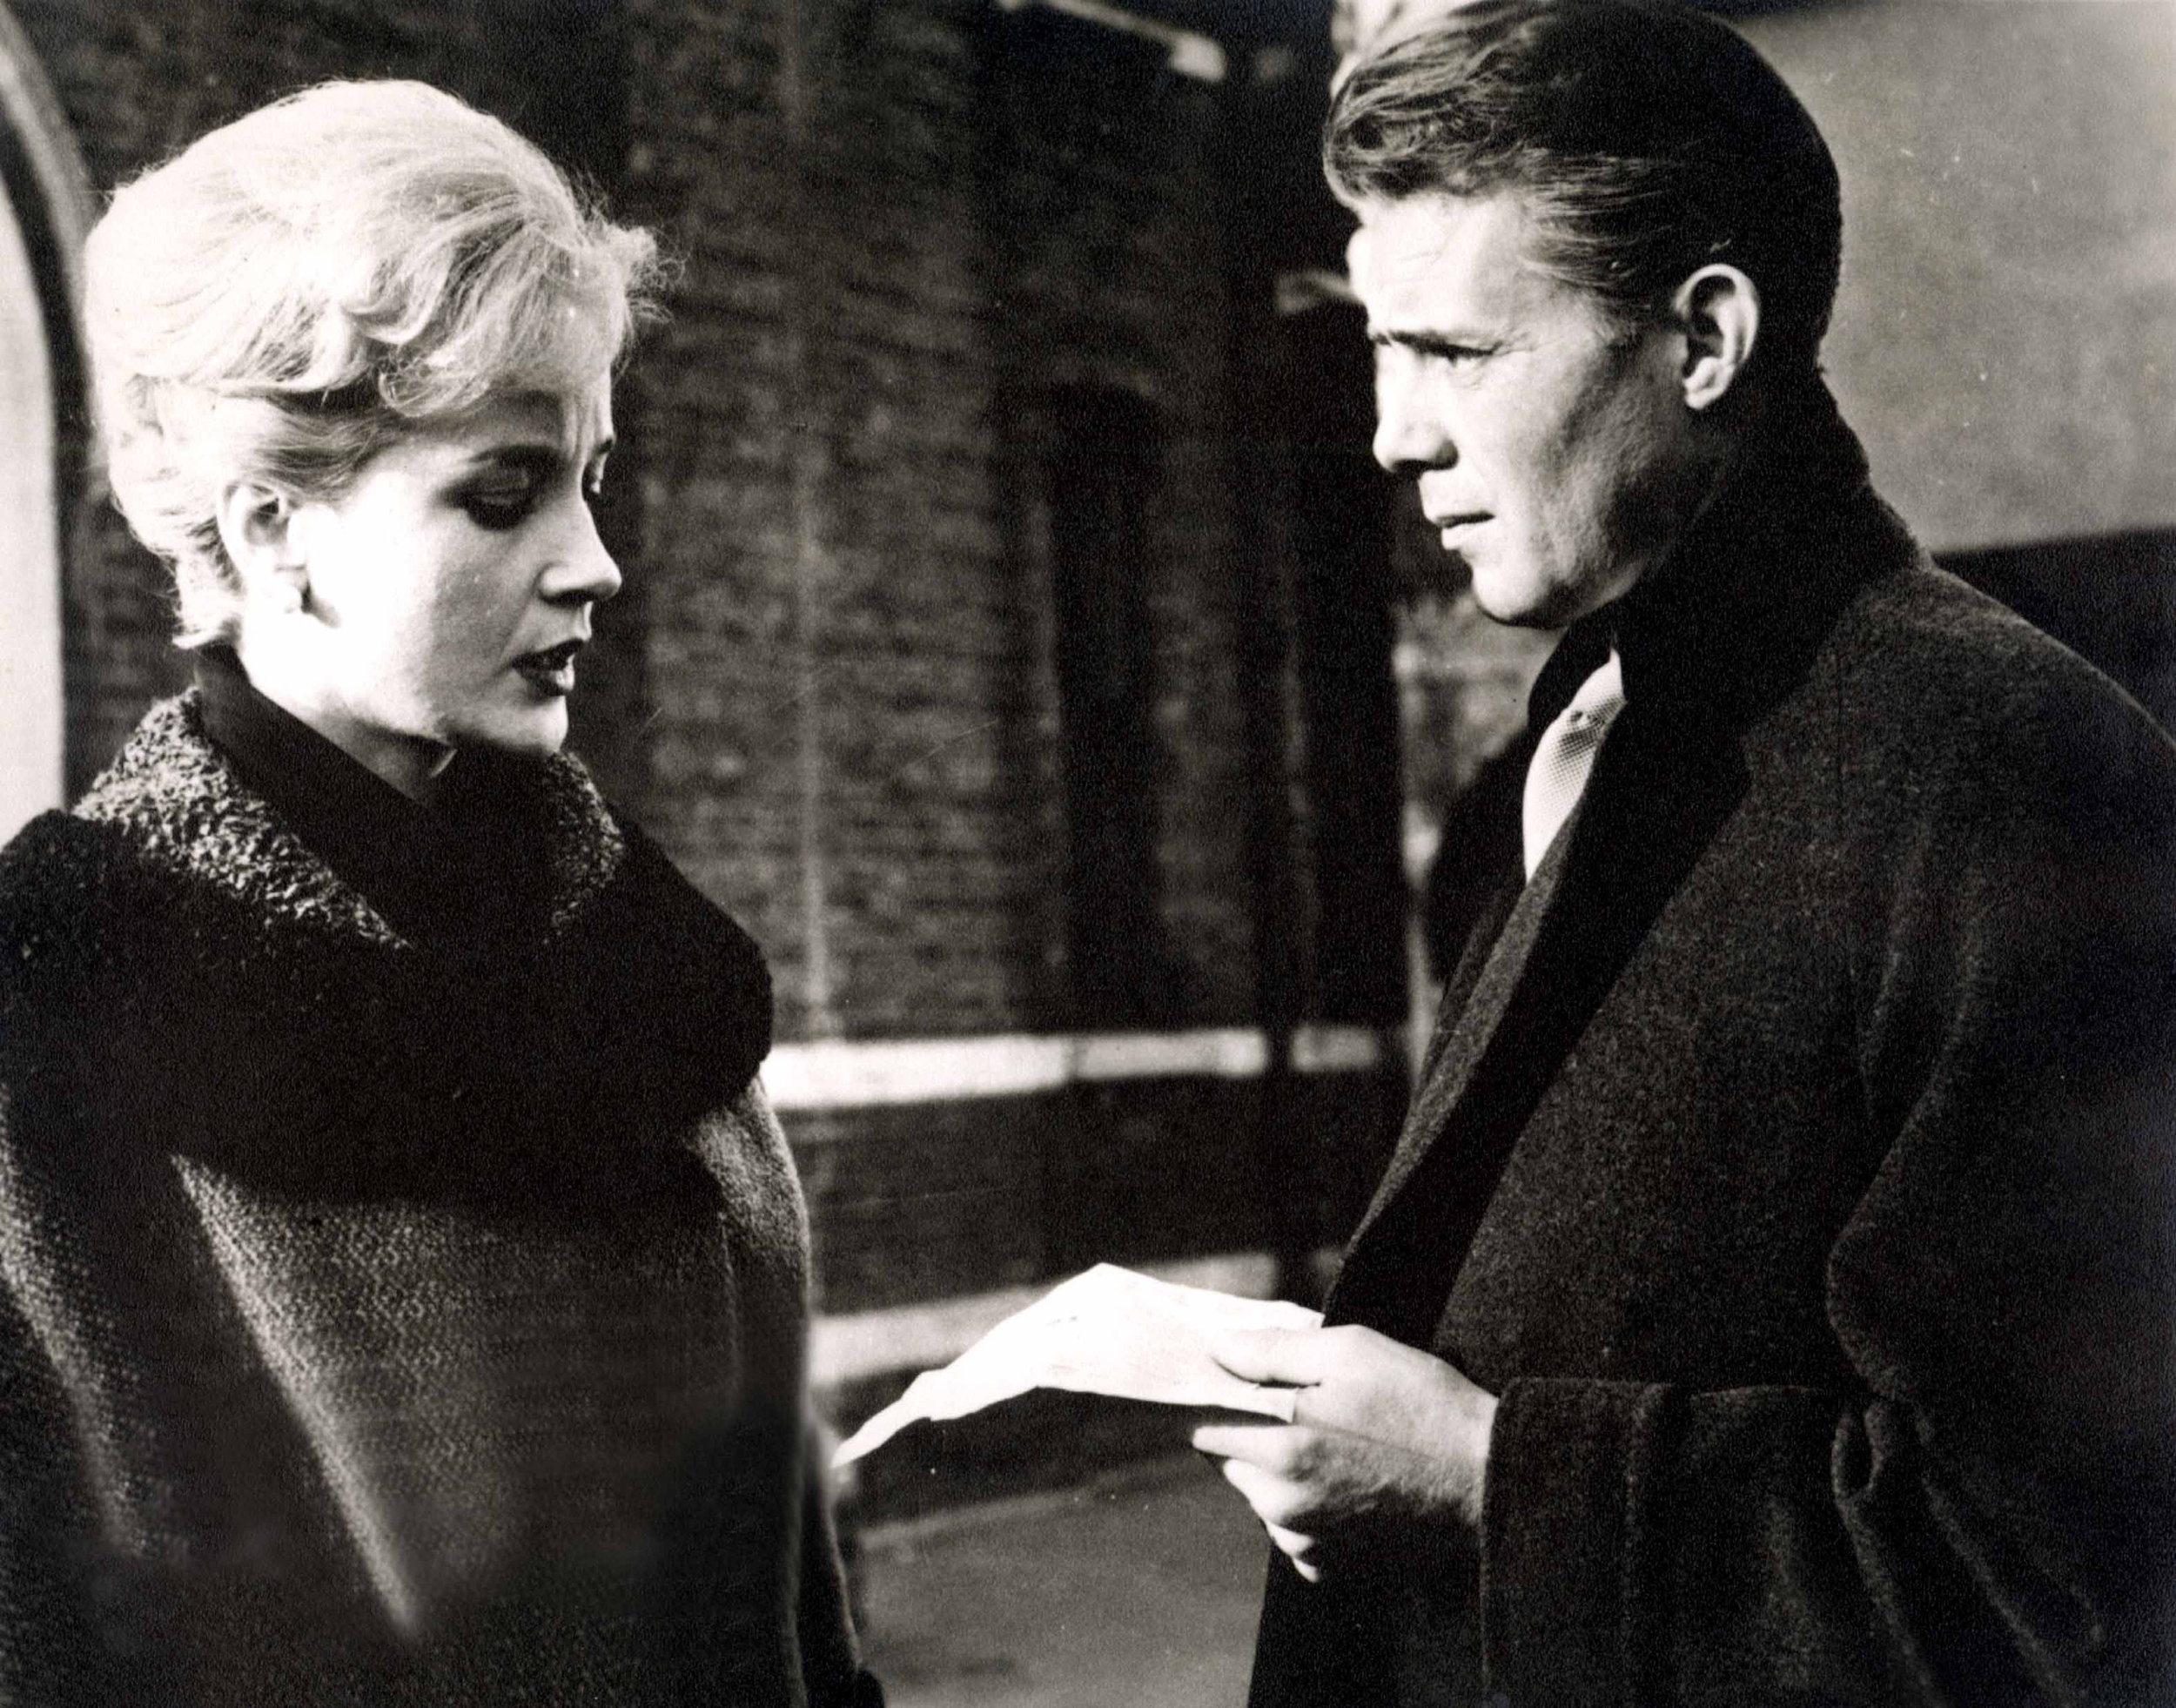 Dick in Victim (1961) alongside Sylvia Sims